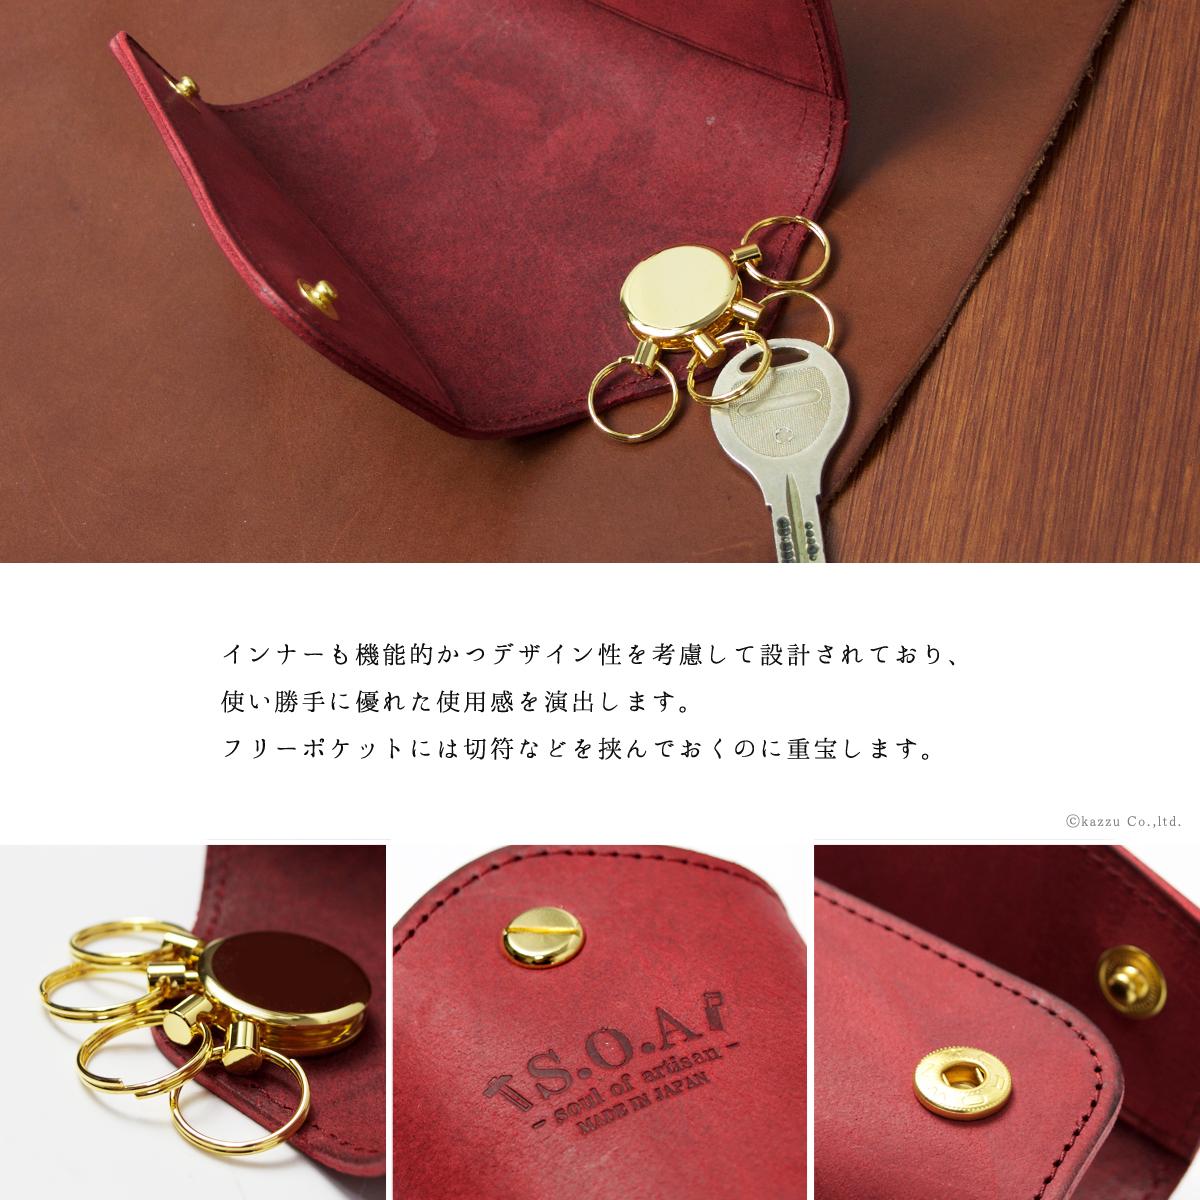 S.O.A メンズ 日本製 4連リング キーケース